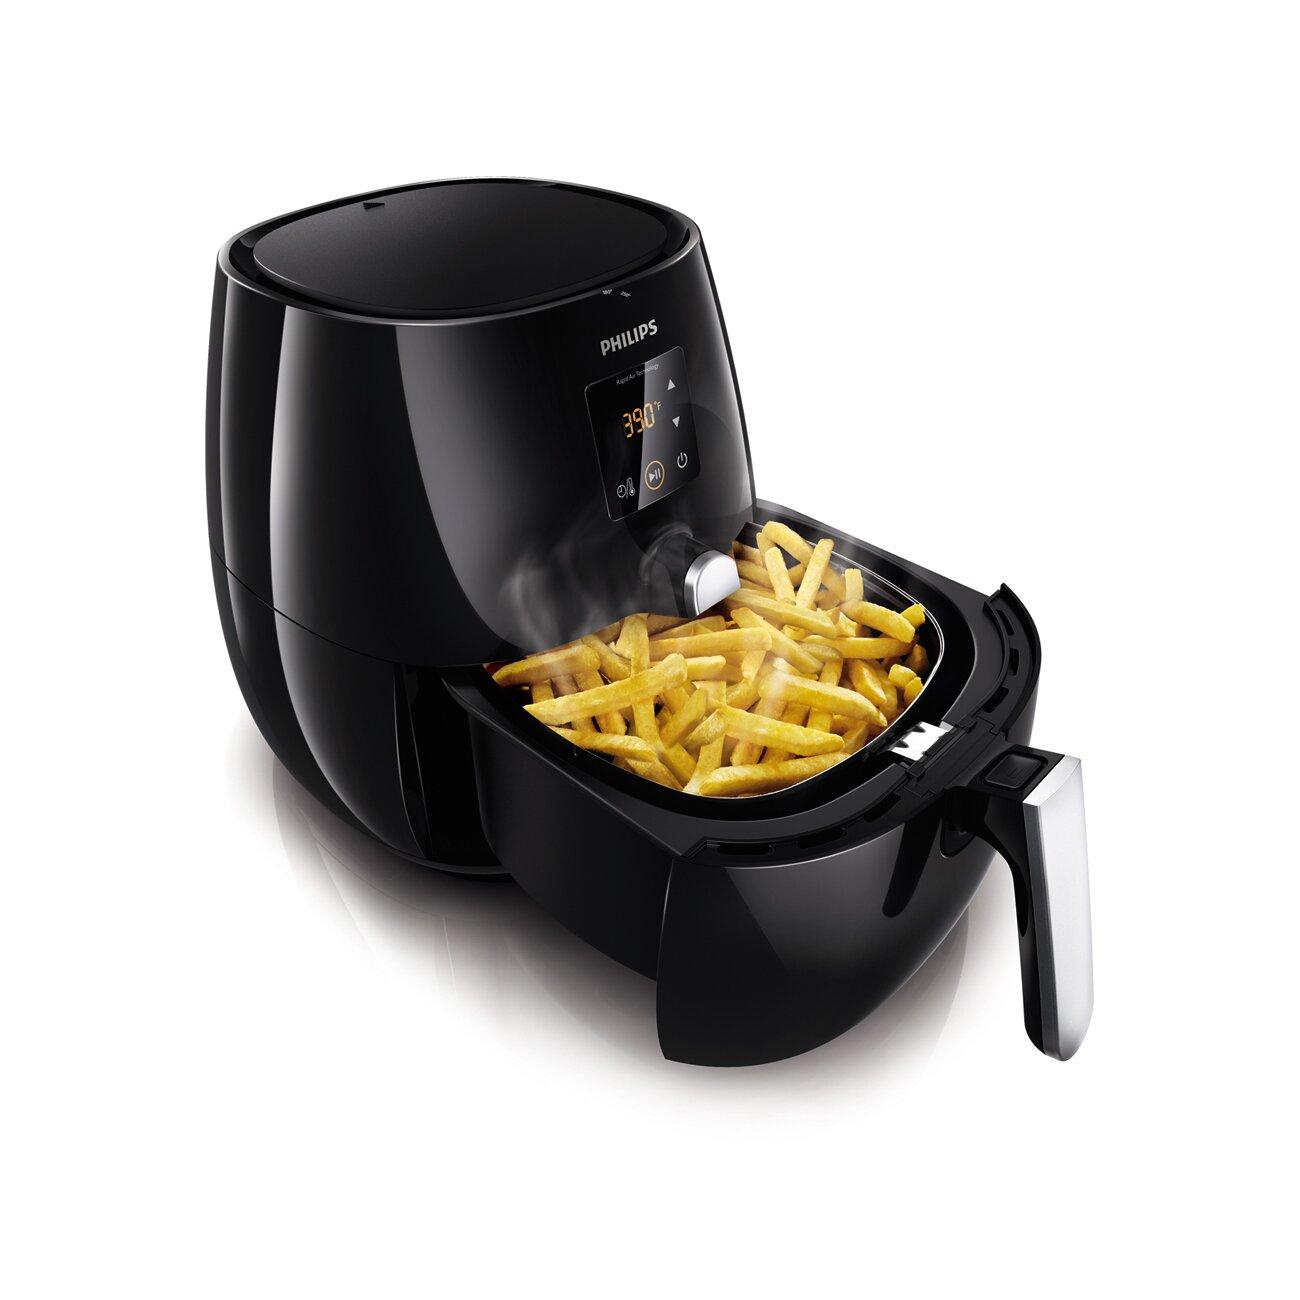 Viva Home Decor Philips Oil Less Fryer With Rapid Air Technology Wayfair